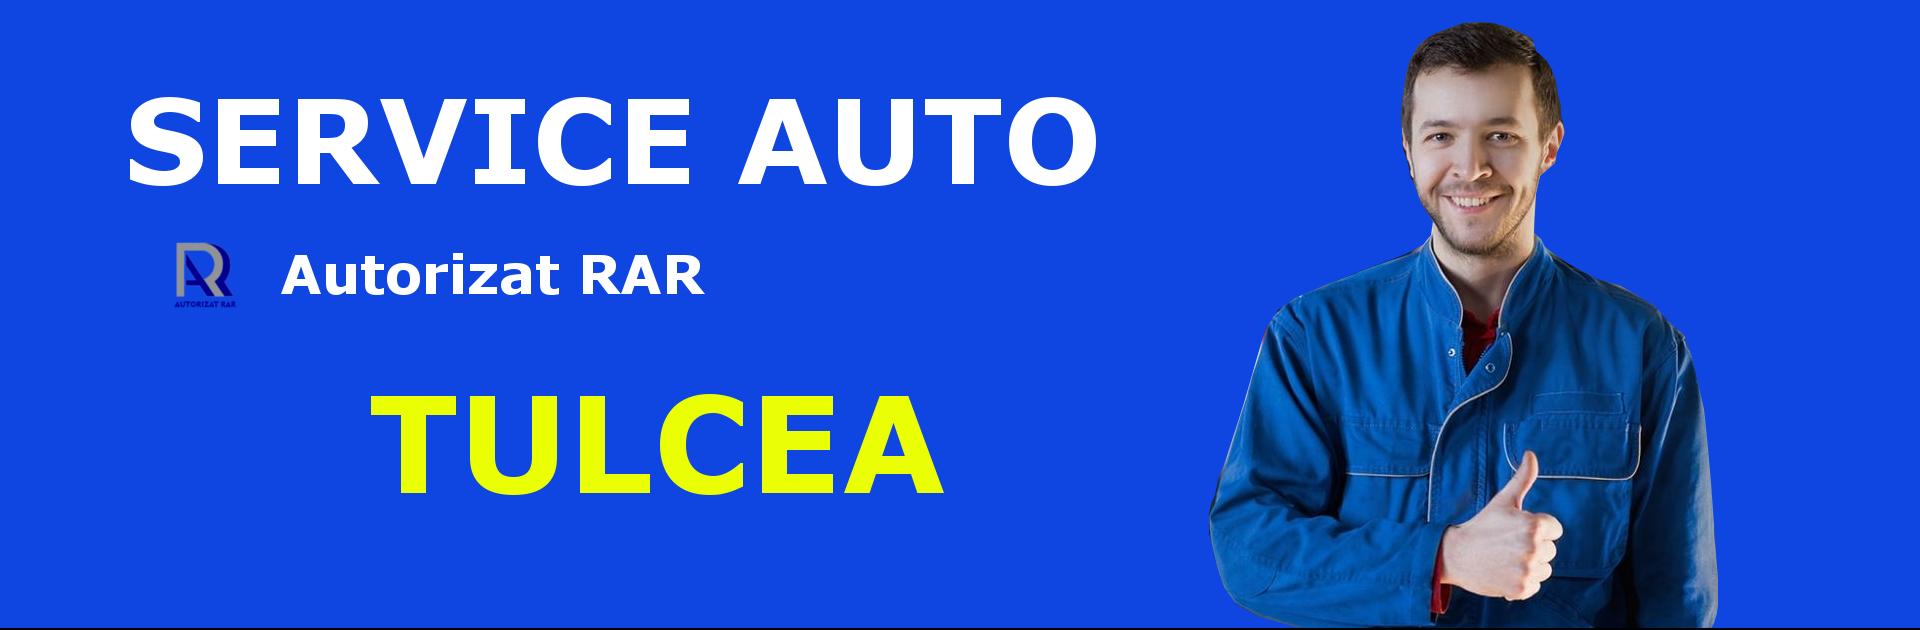 Banner service TULCEA